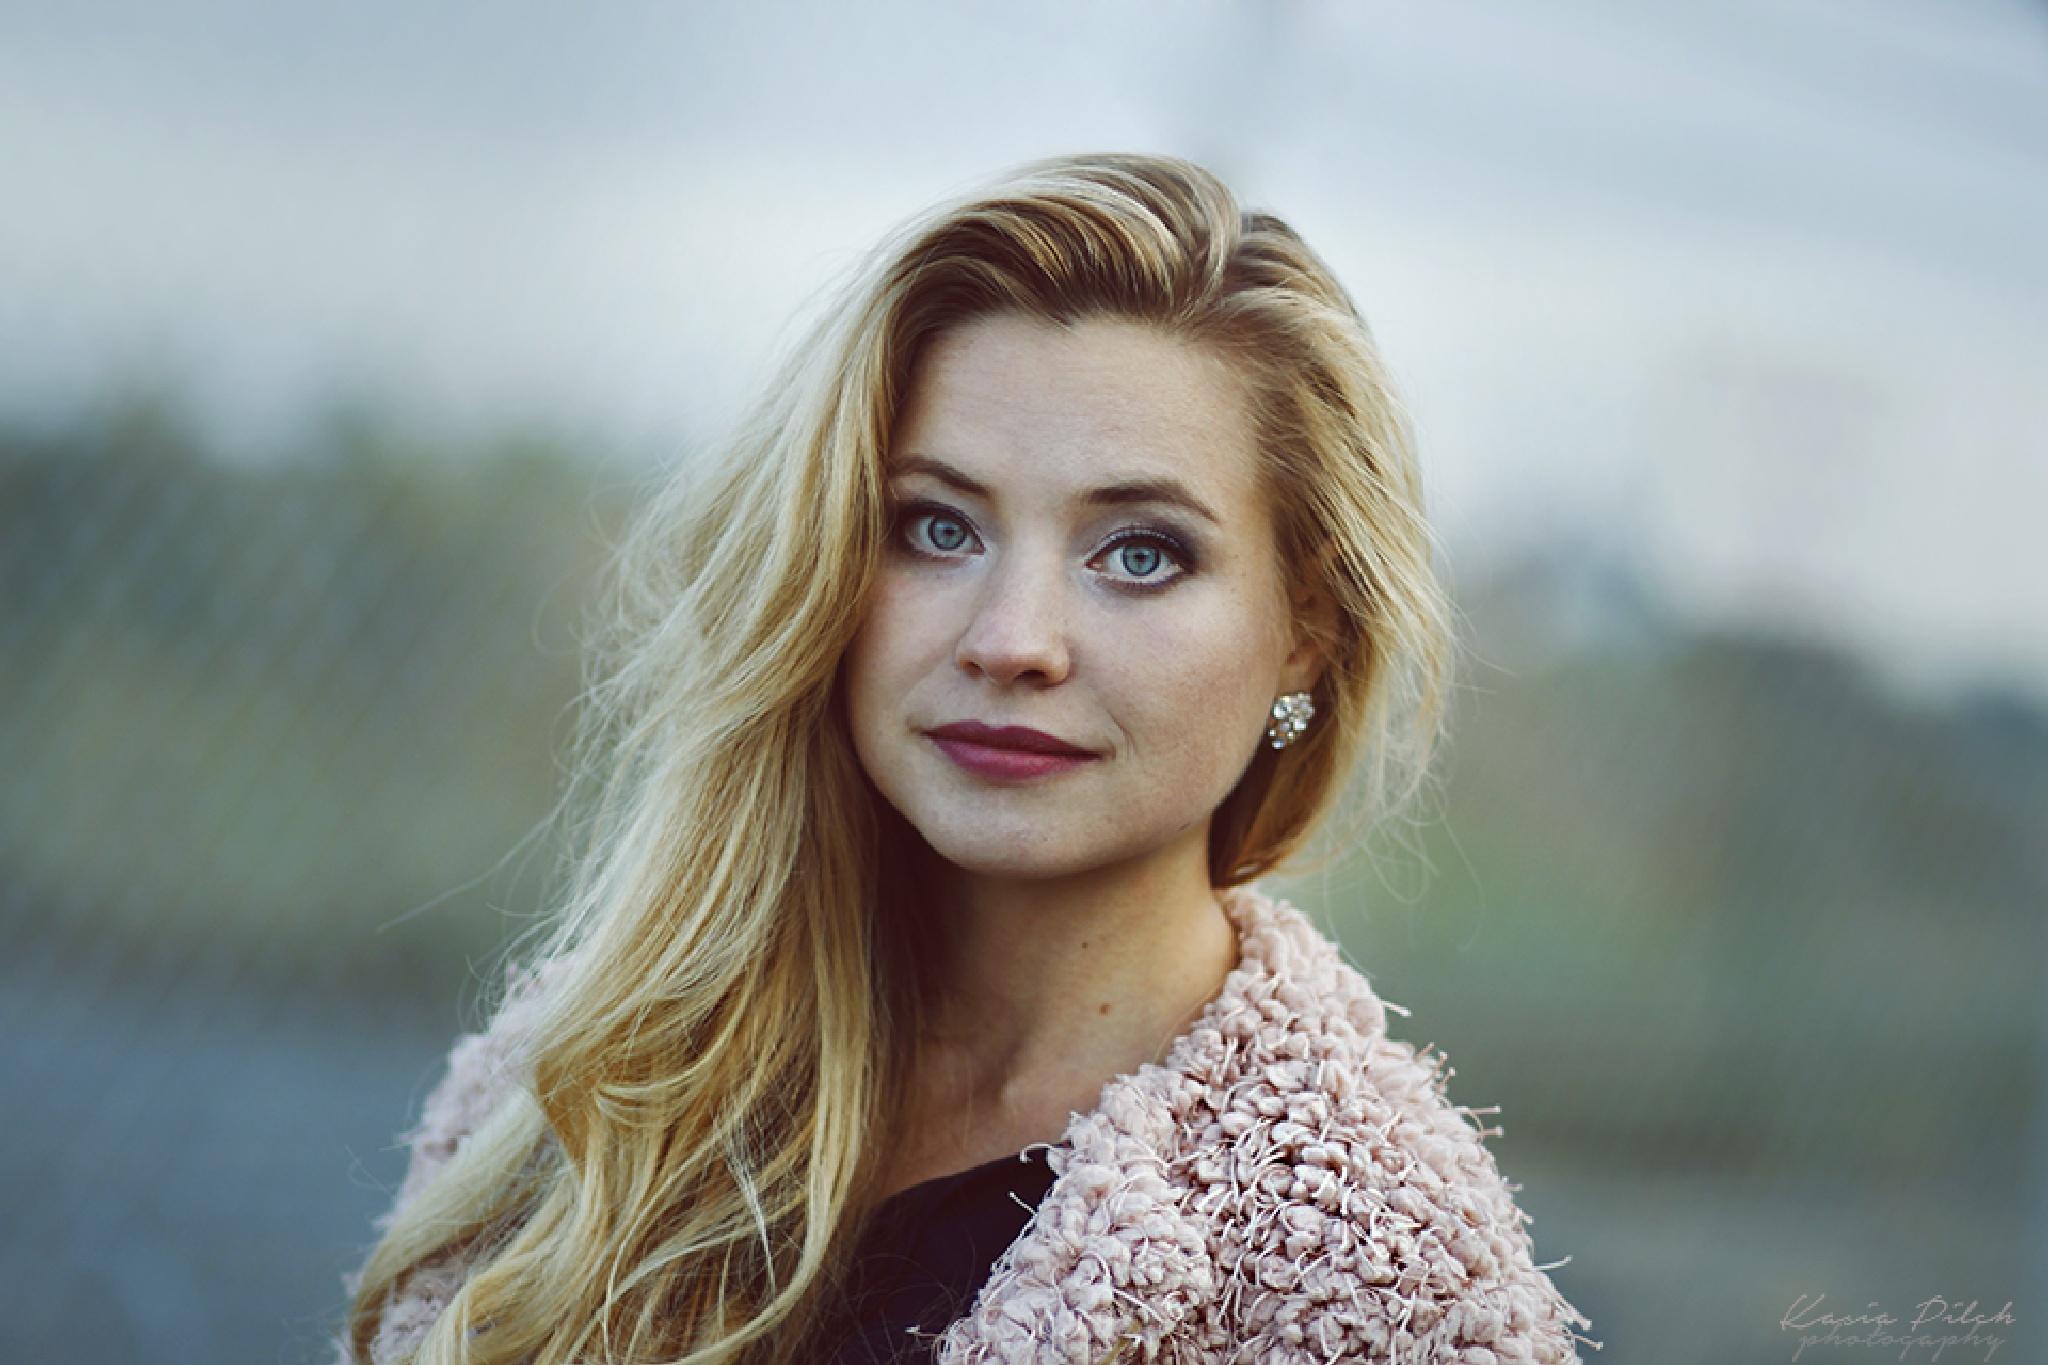 Juliette II by Kasia Pilch / chocarome